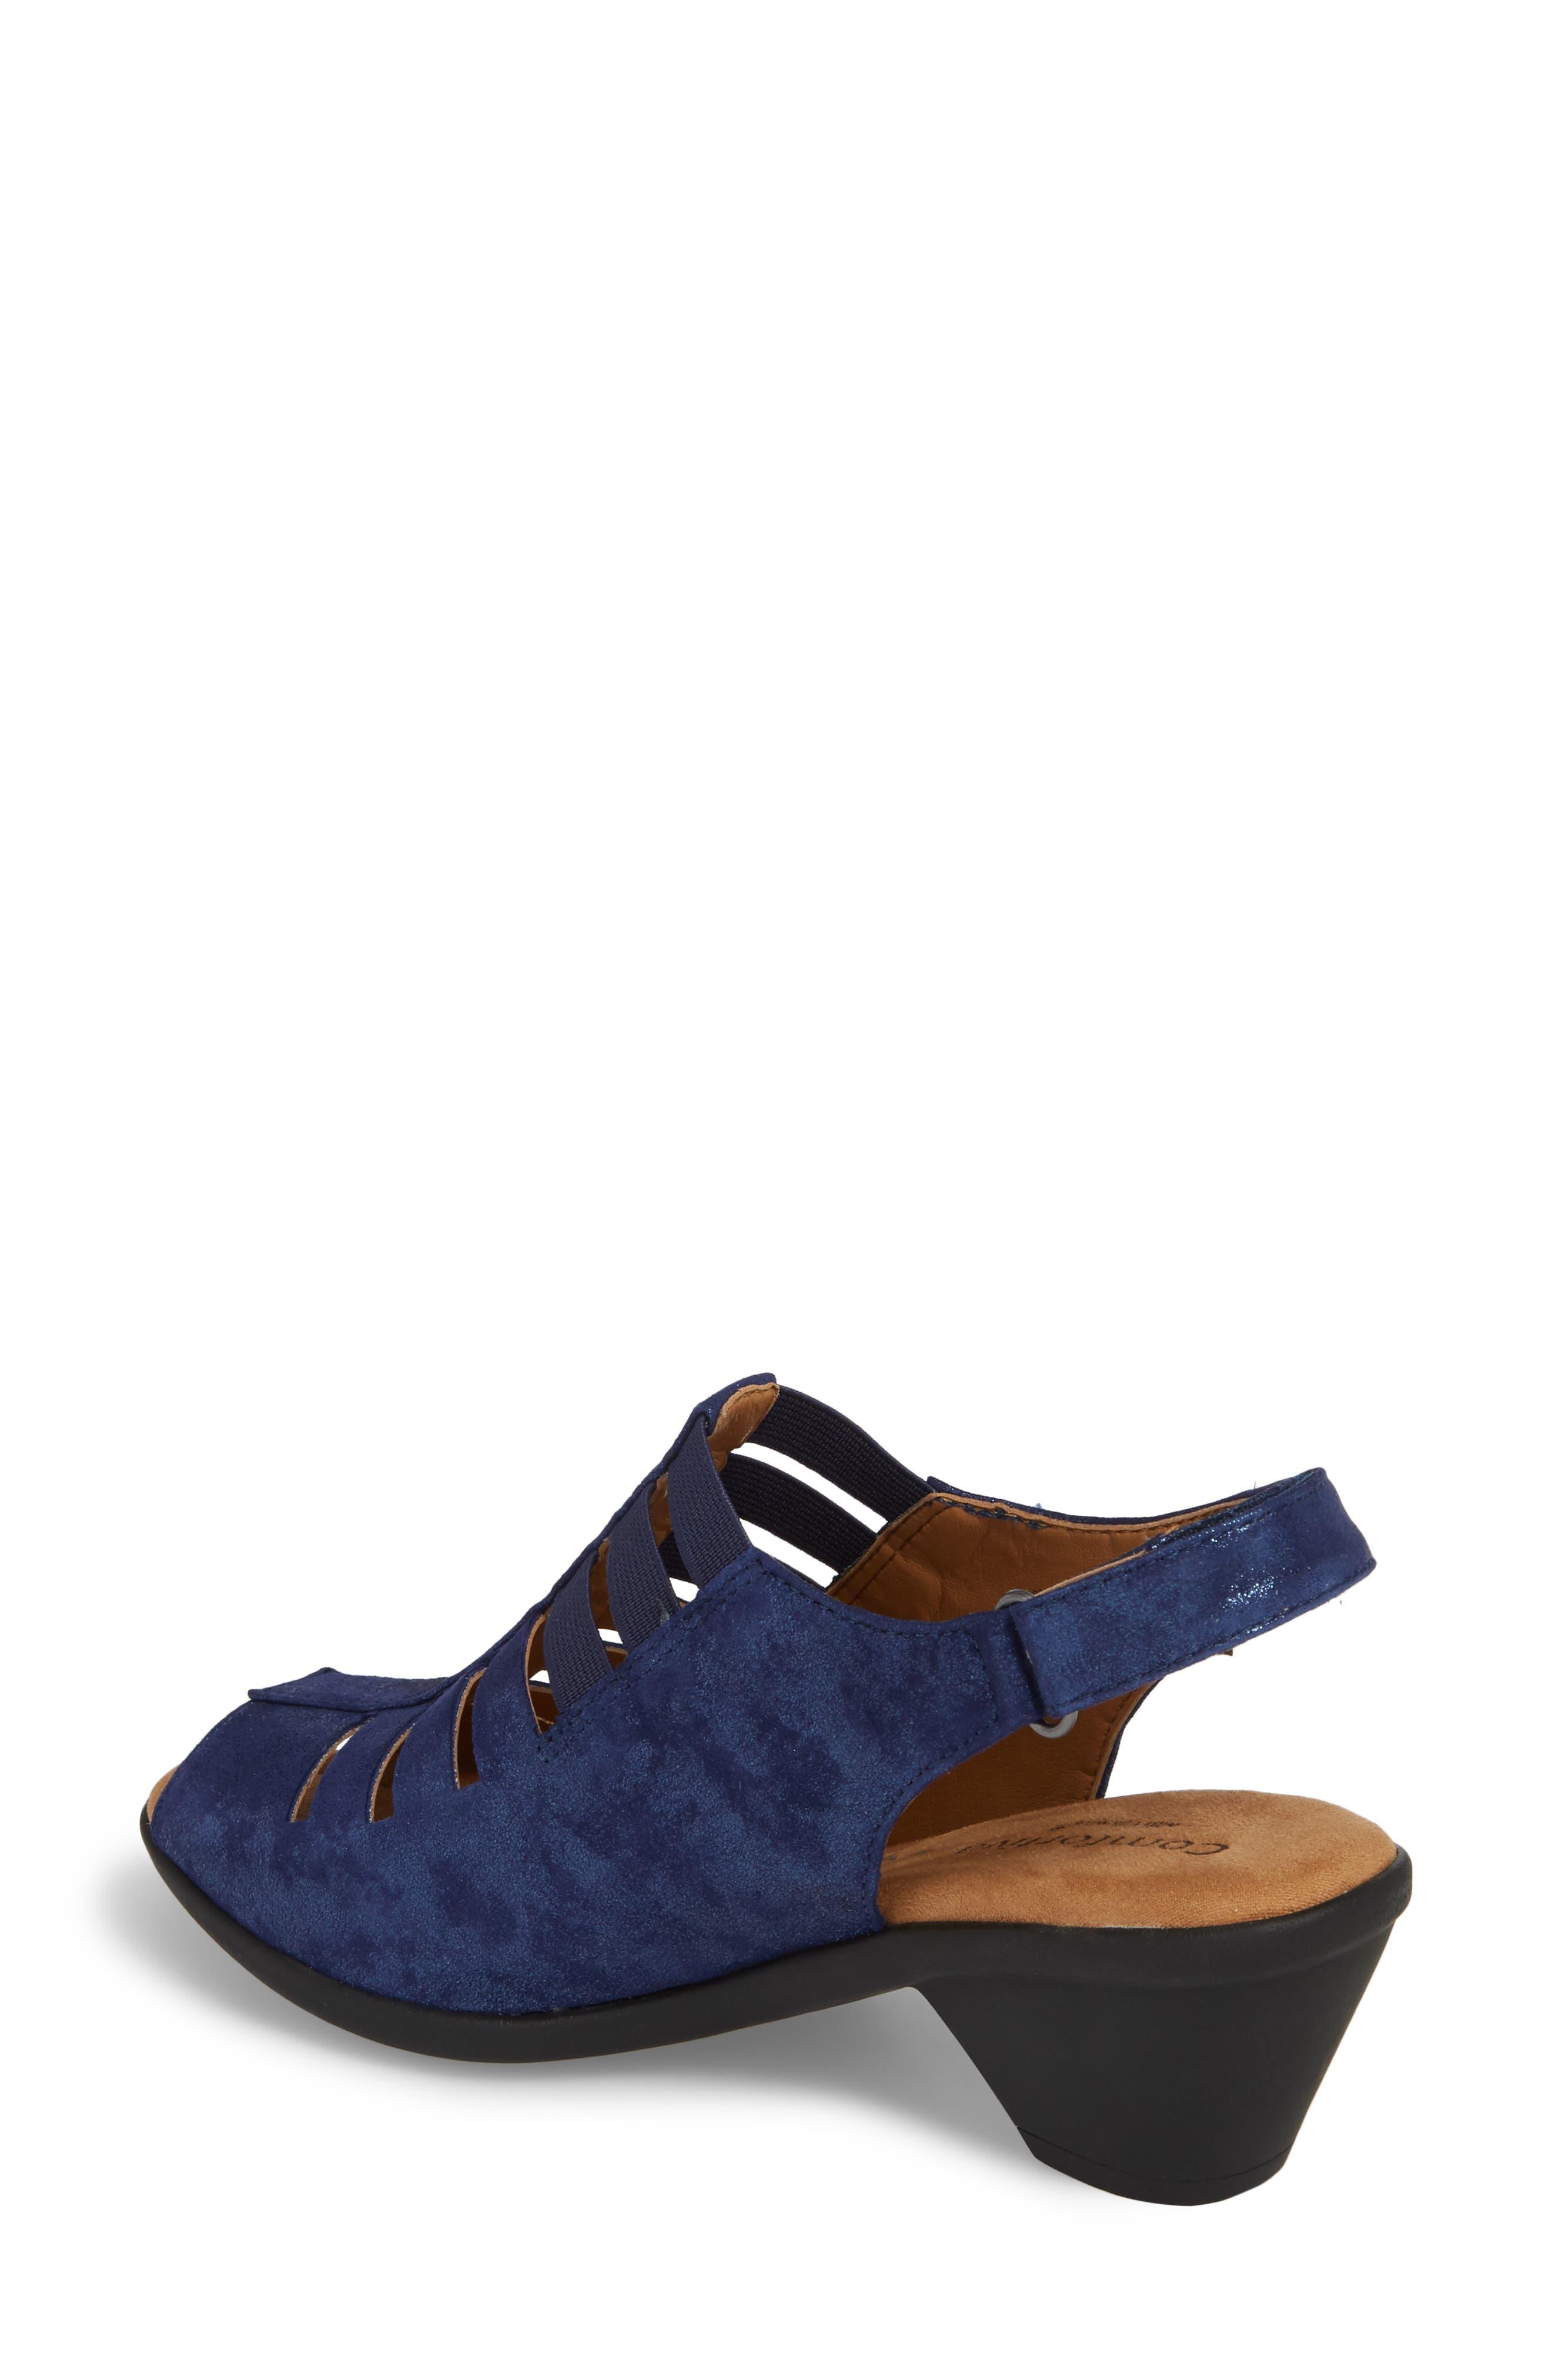 Faye Sandal,                             Alternate thumbnail 2, color,                             Pea Coat Navy Leather